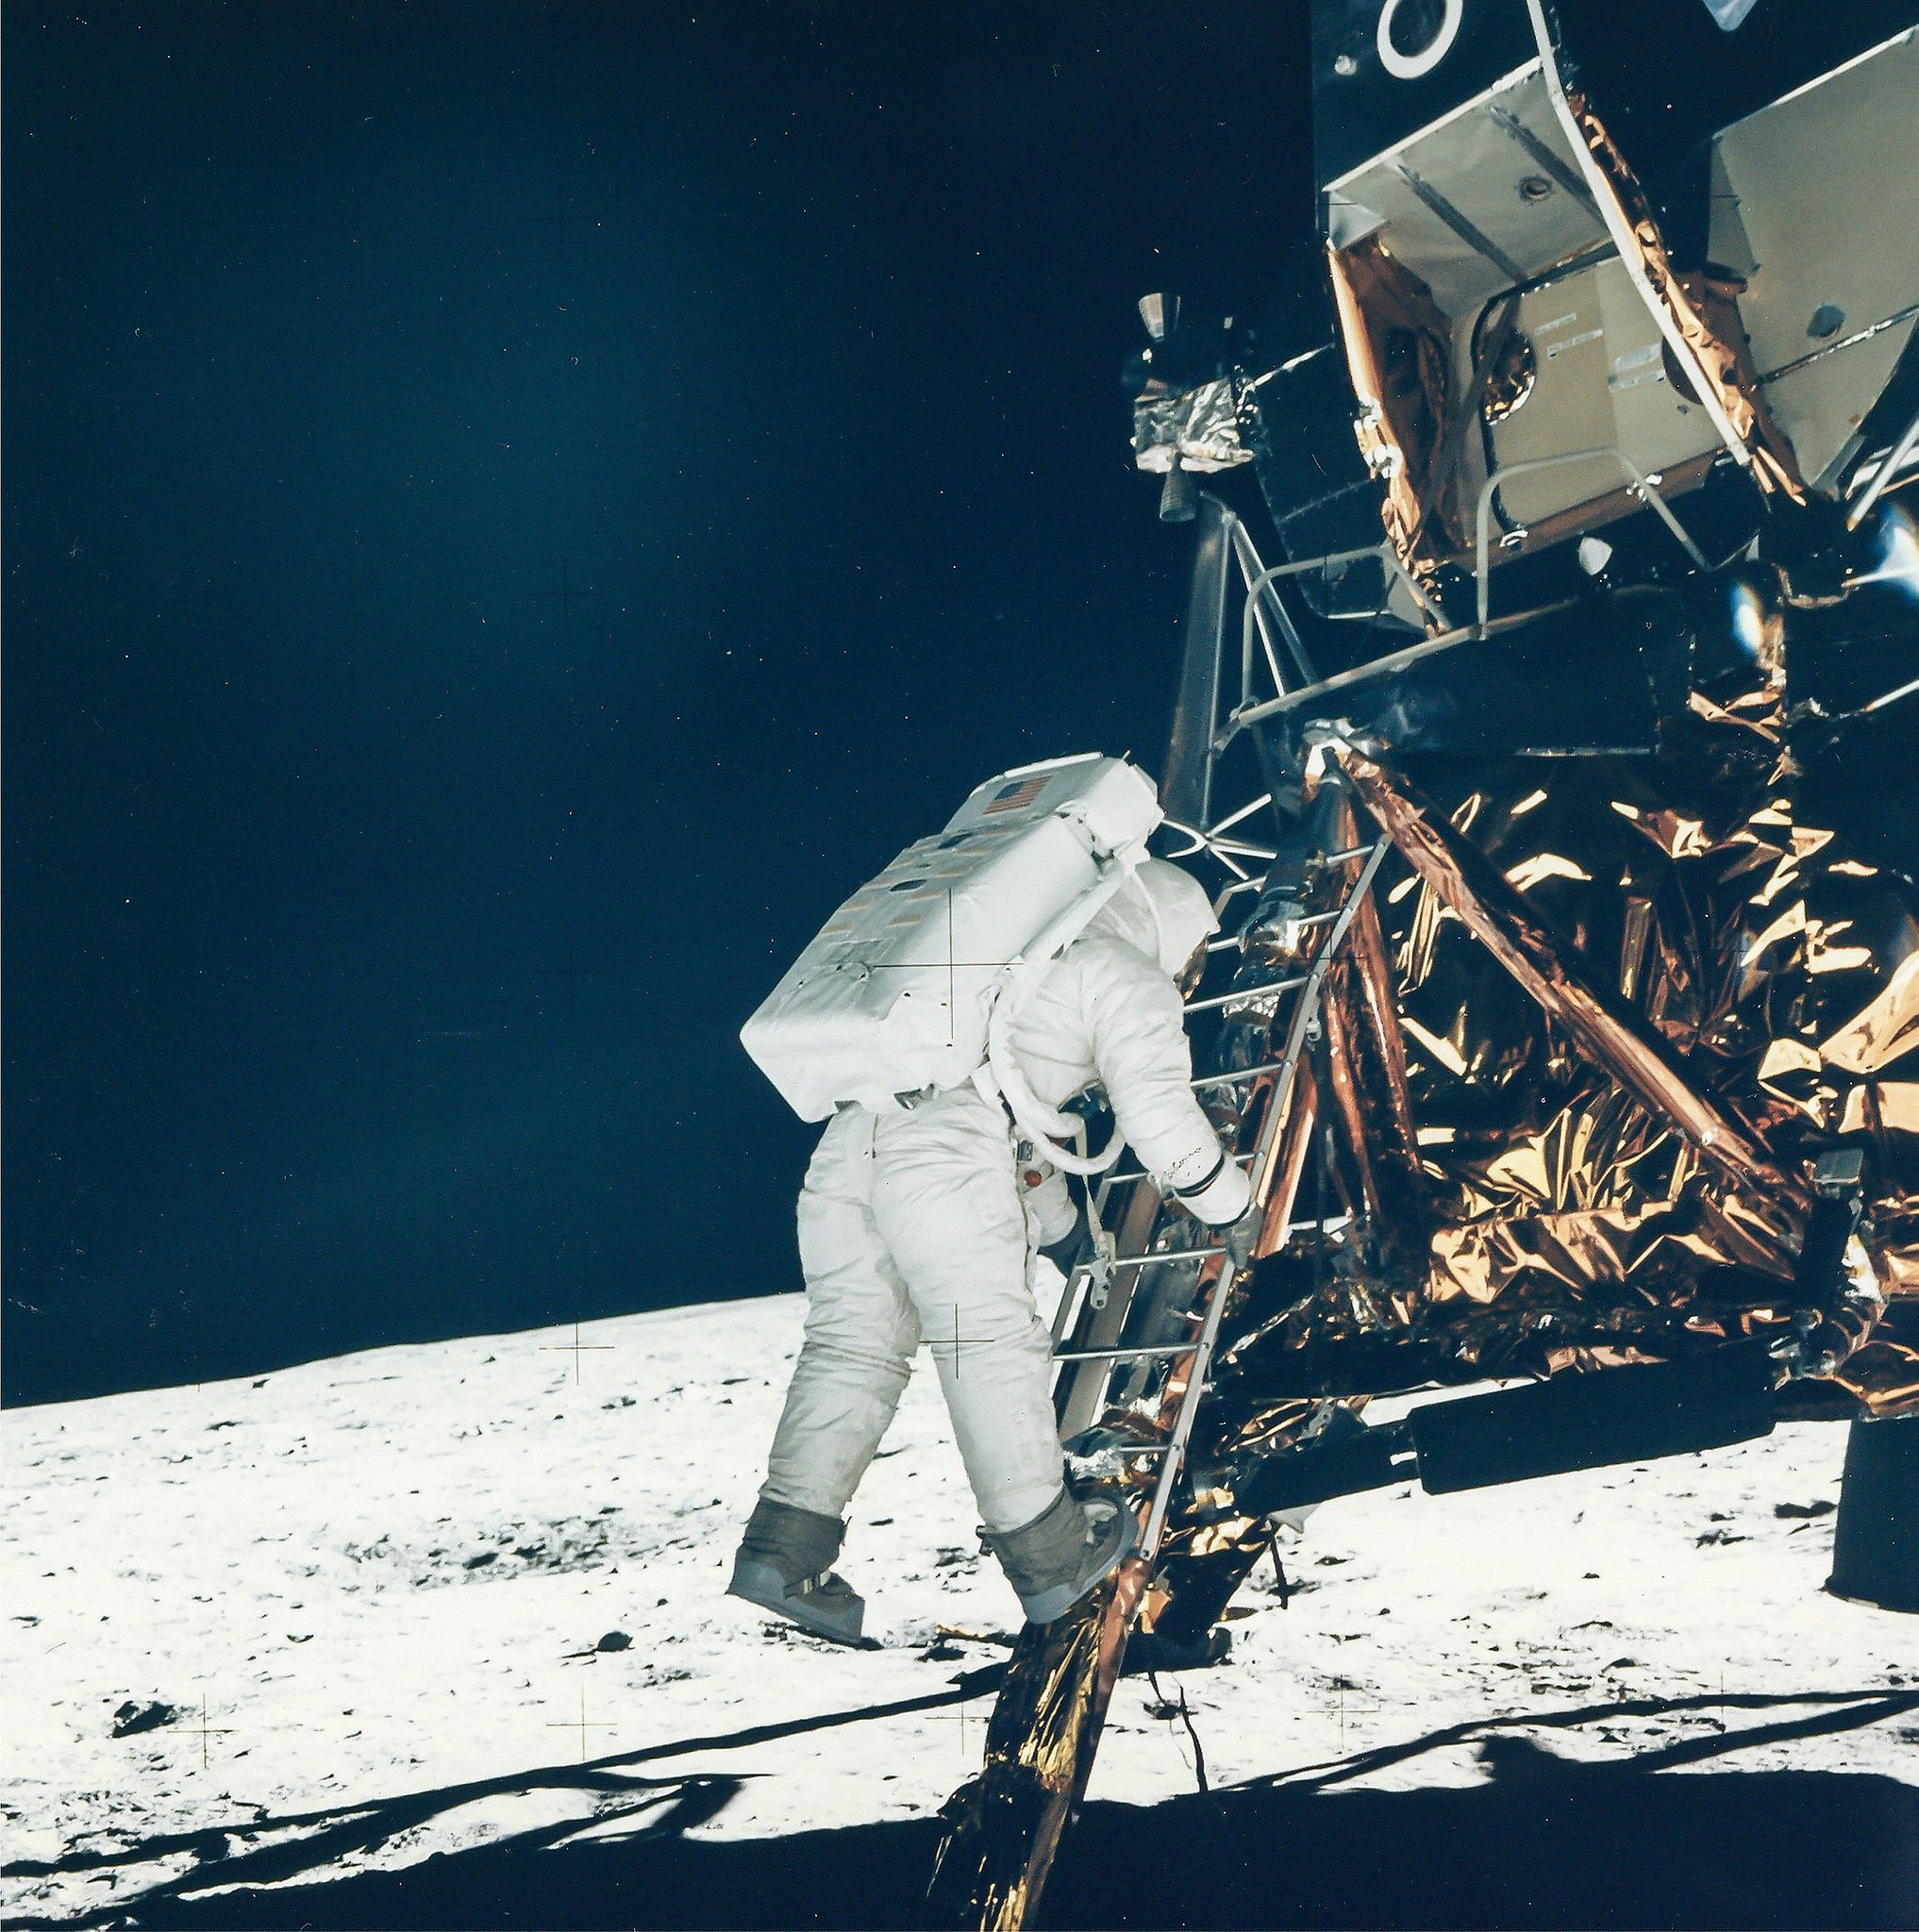 801b748f51164ce2a309d2e46ef540fc - How Long To Get To The Moon Apollo 11